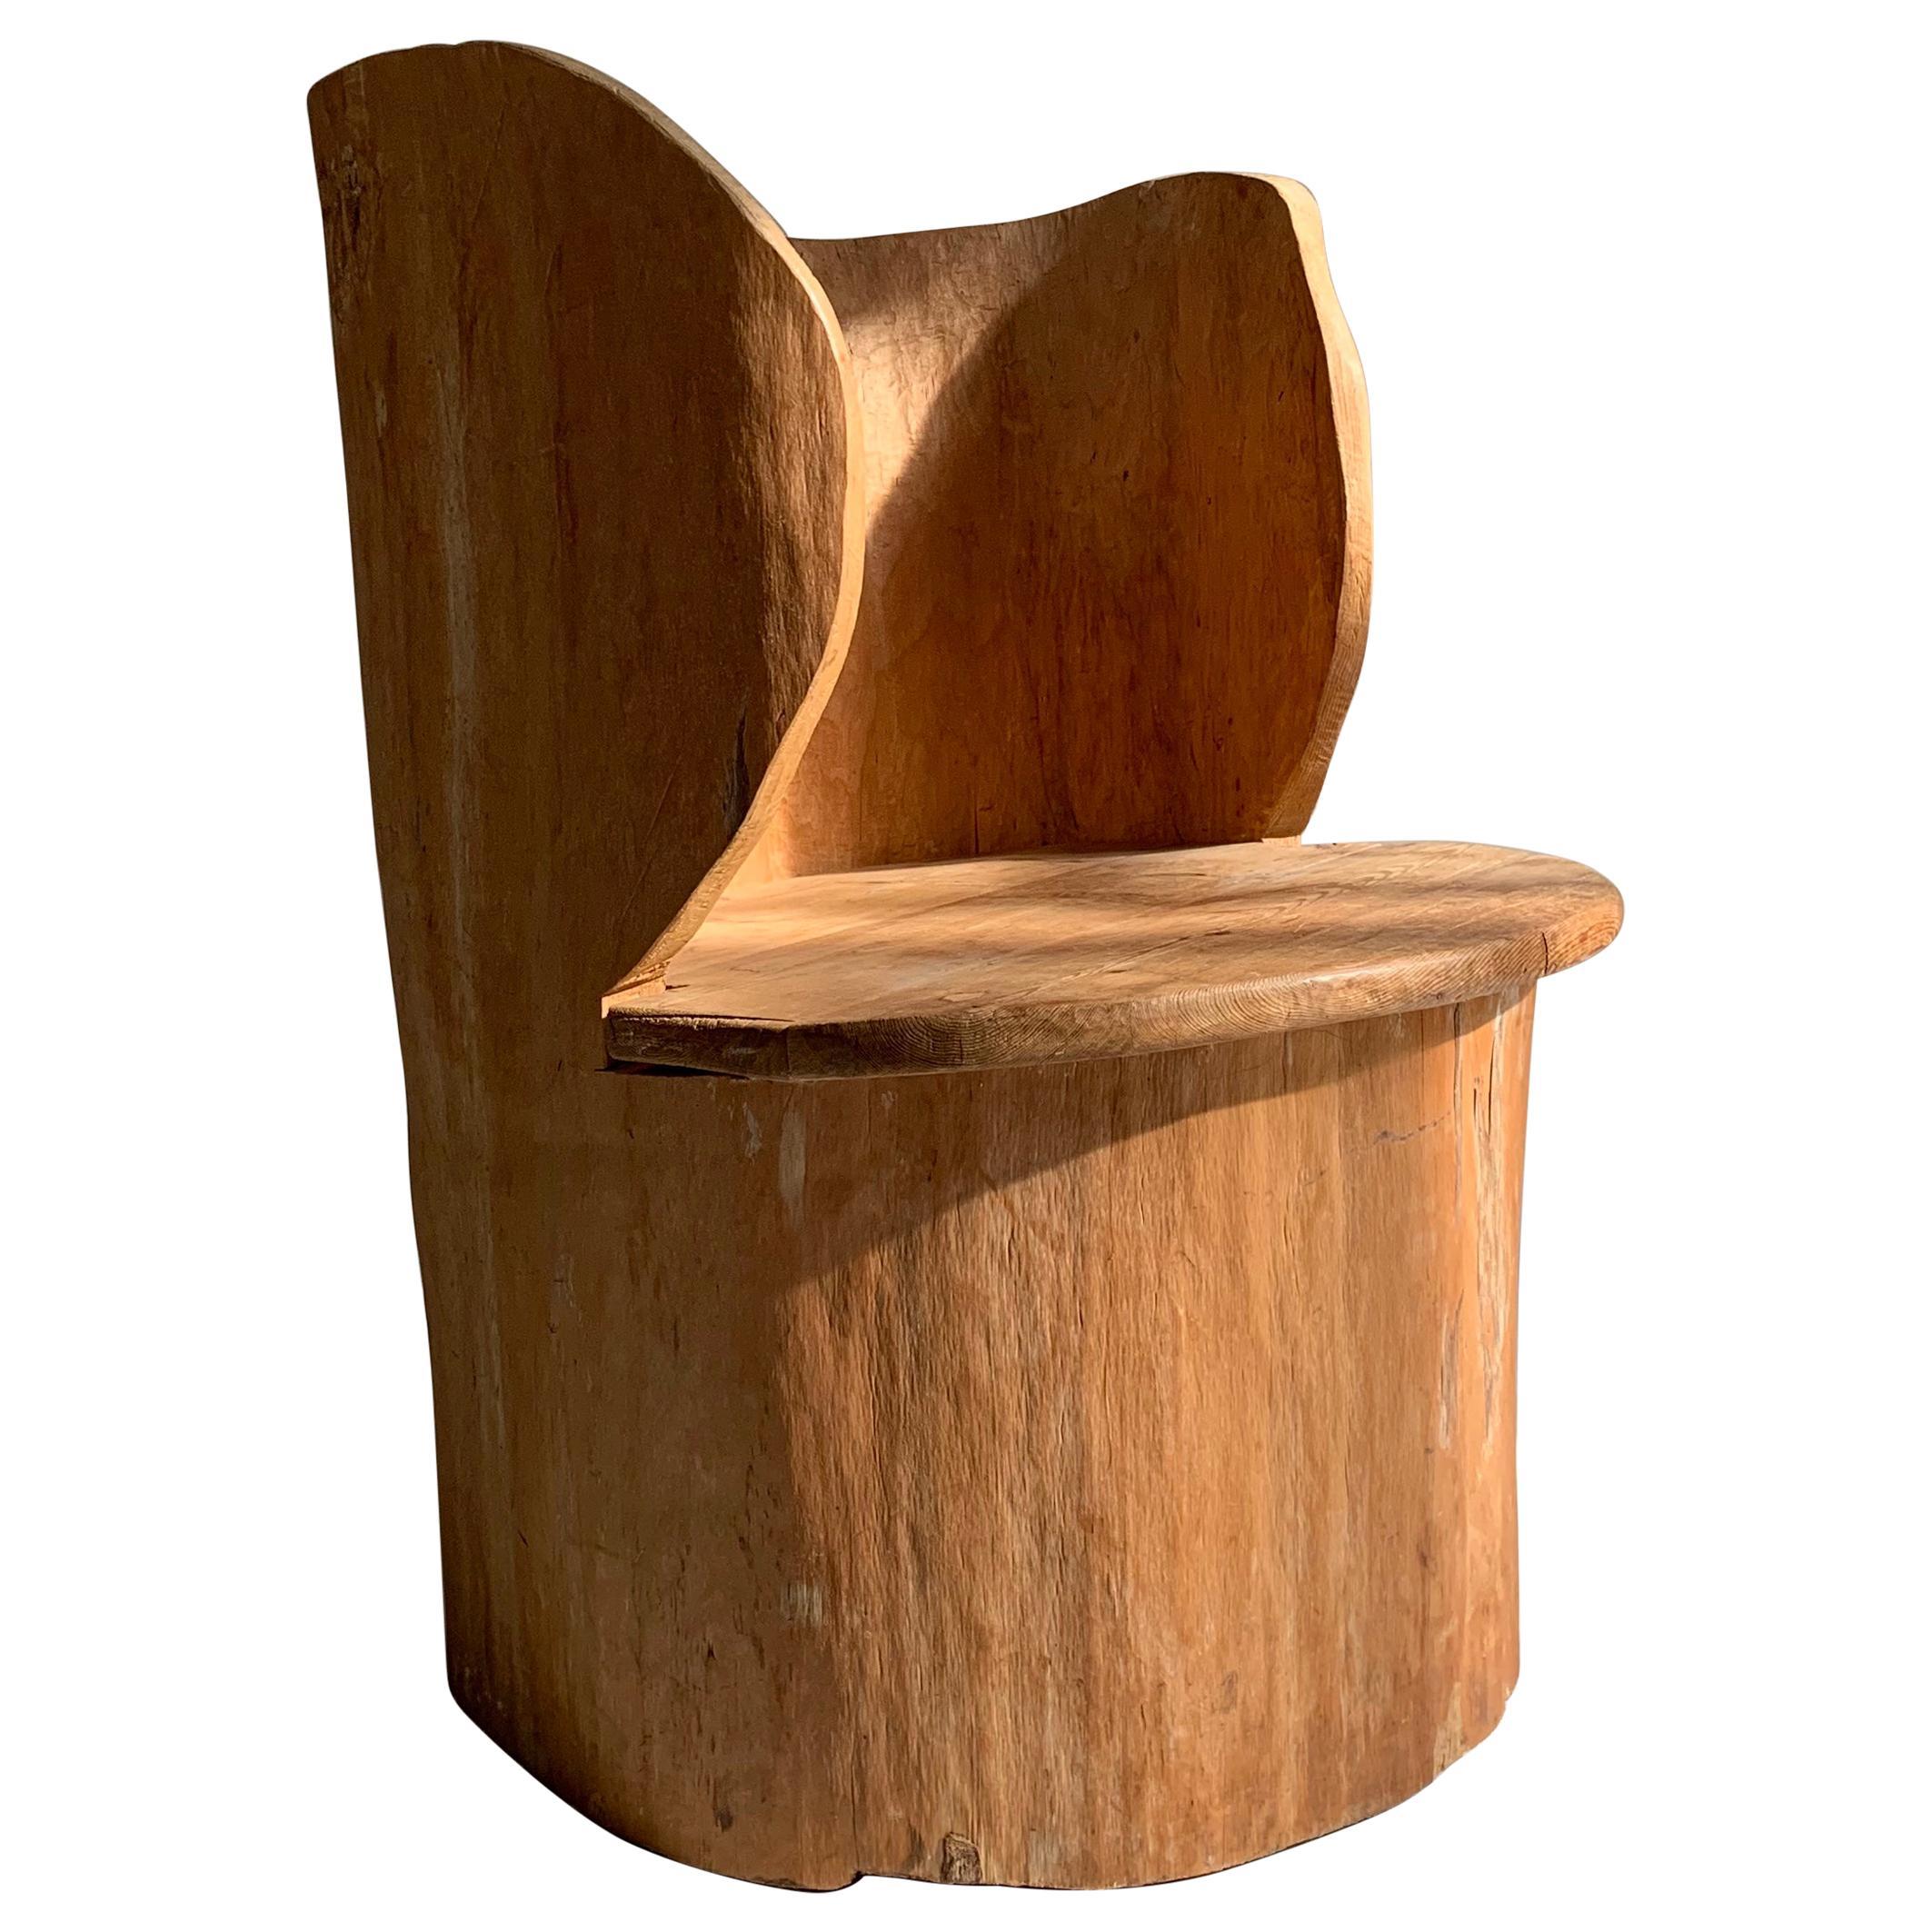 Swedish Sculptural Brutalist Stump Chair in Pine, circa 1950s